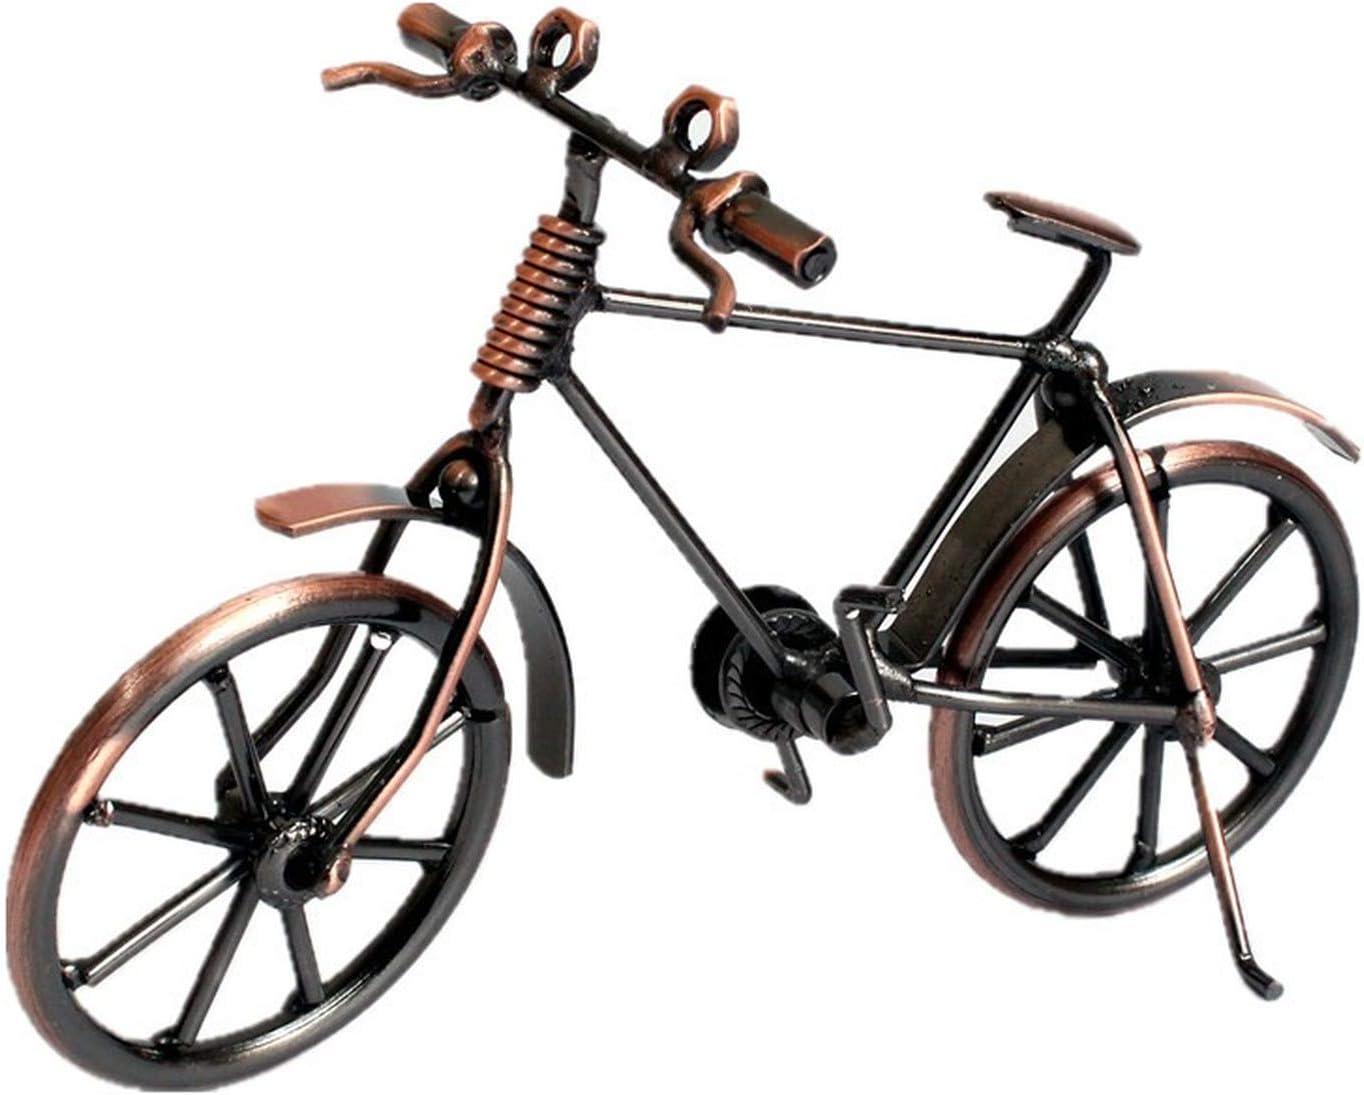 LUOWAN Home Decoration Retro Metal Bike Model Craft Bicycle Figurine for Friend Gifts Children Birthday Toy Present Desktop Crafts Creative (Z1, 18x7x12cm)